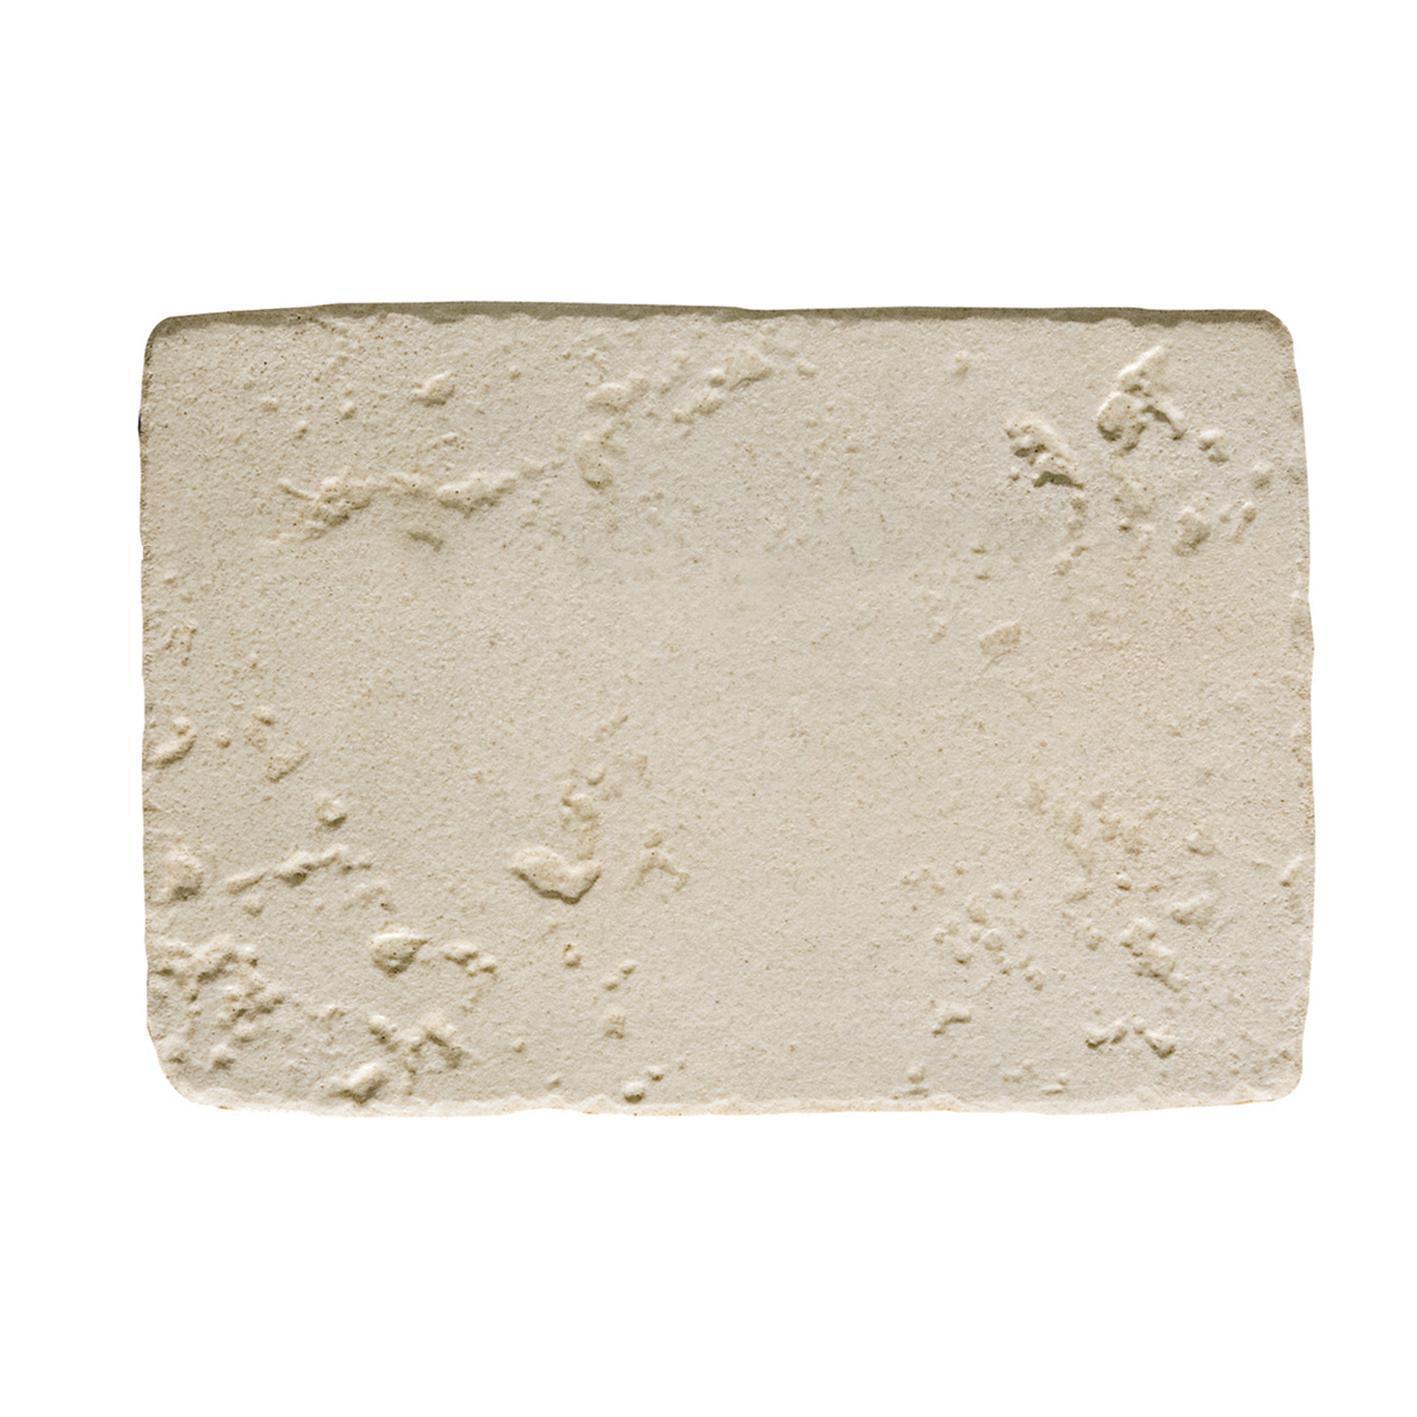 Piastrella Abbazie Cluny 33 x 50 cm sp. 9.5 mm PEI 4/5 bianco - 2